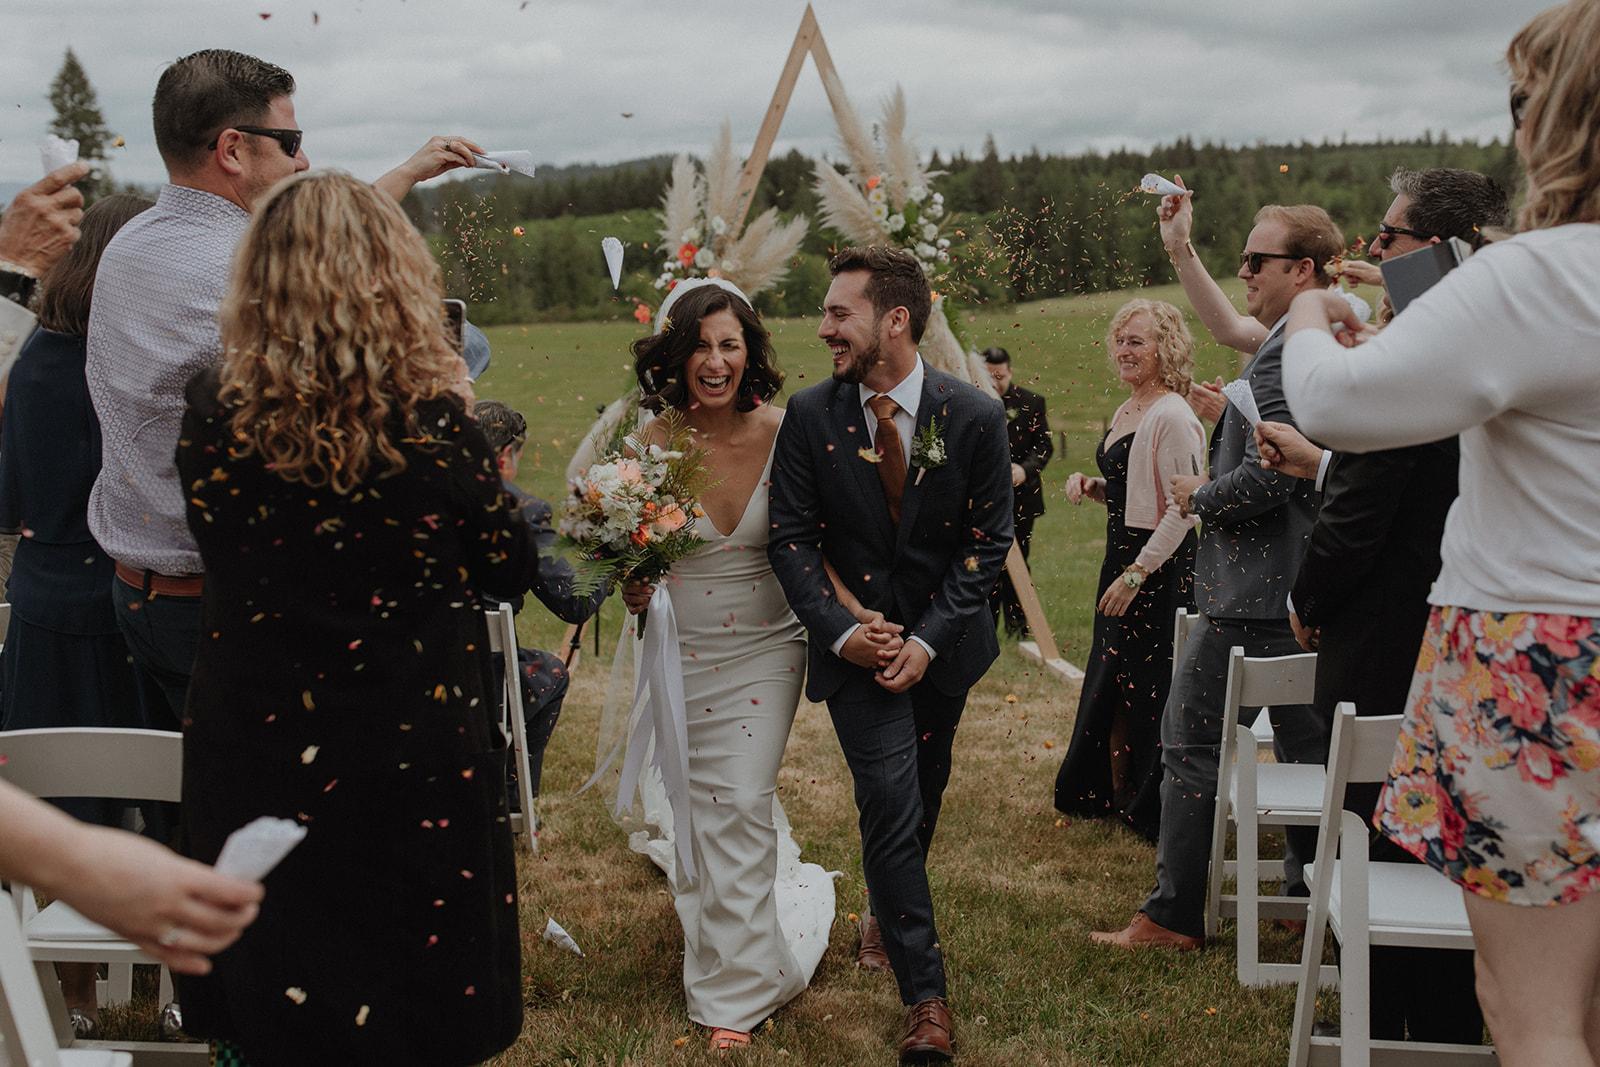 cortney_skye_wedding_june2019-428.jpg